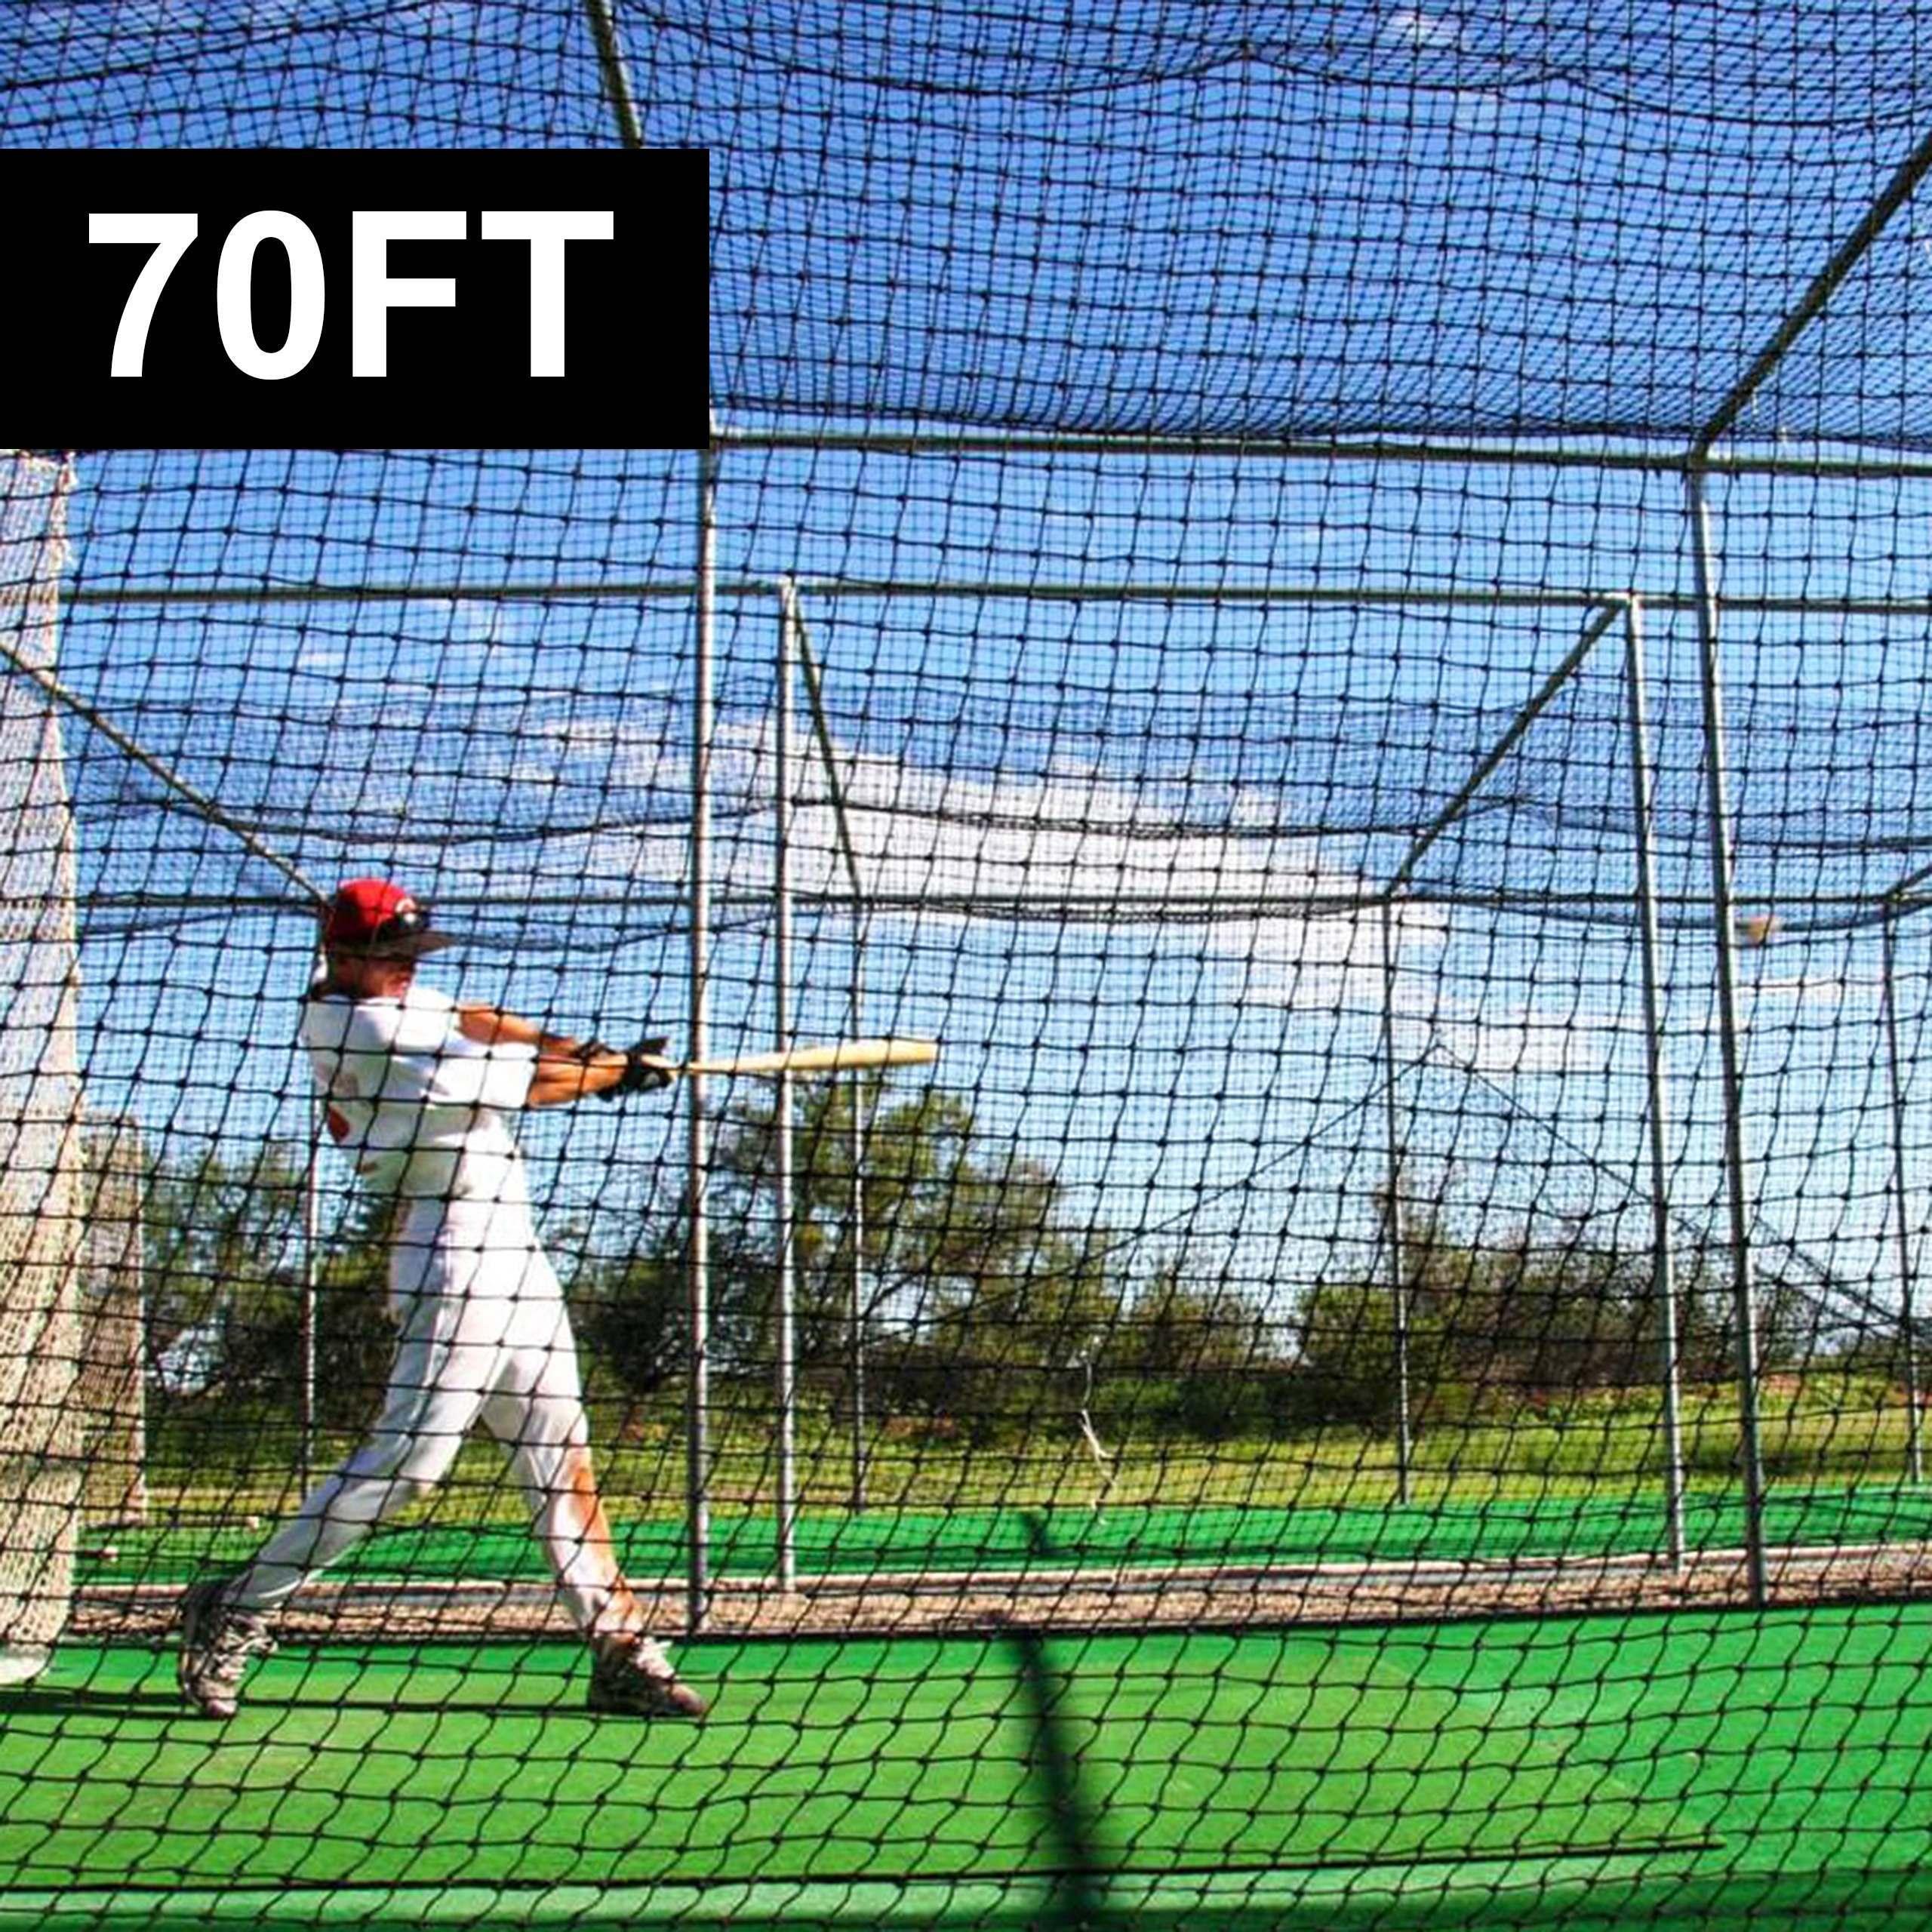 70ft x 14ft Baseball Batting Cage Nets #42 | Net World Sports